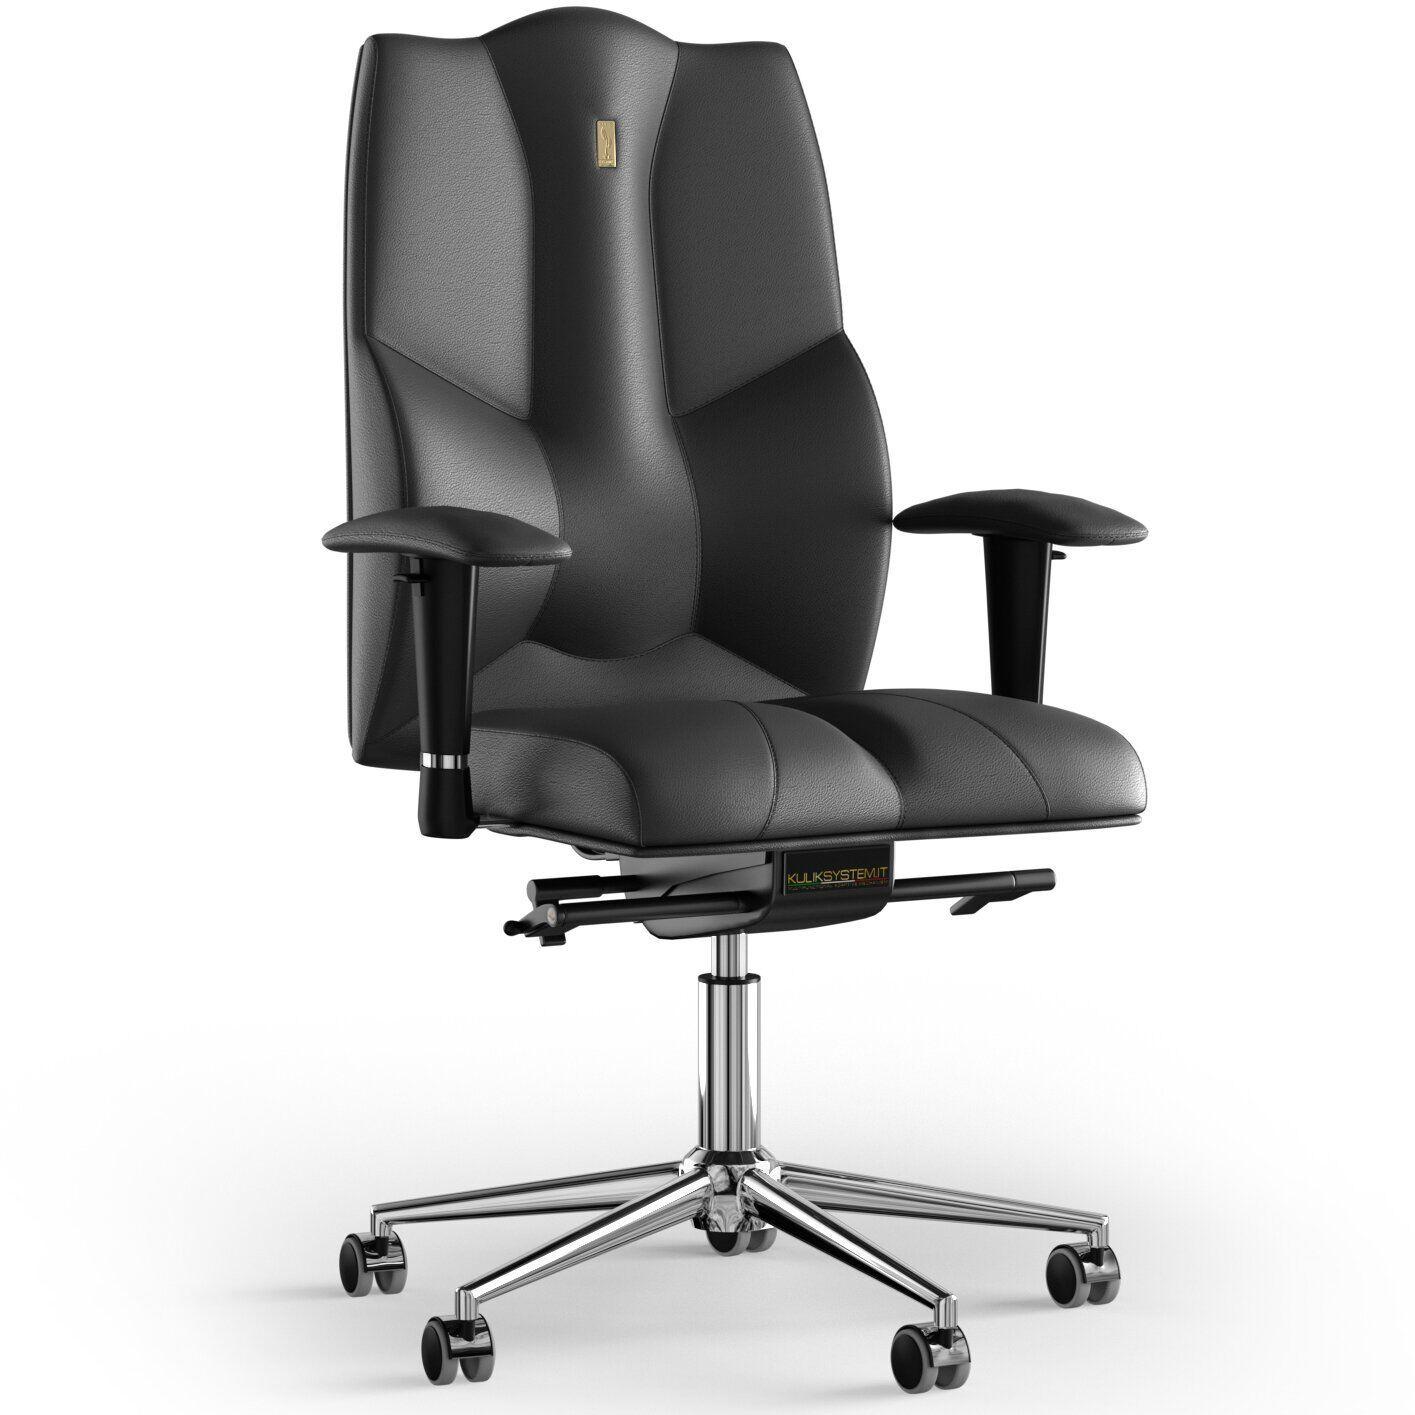 Кресло KULIK SYSTEM BUSINESS Кожа без подголовника без строчки